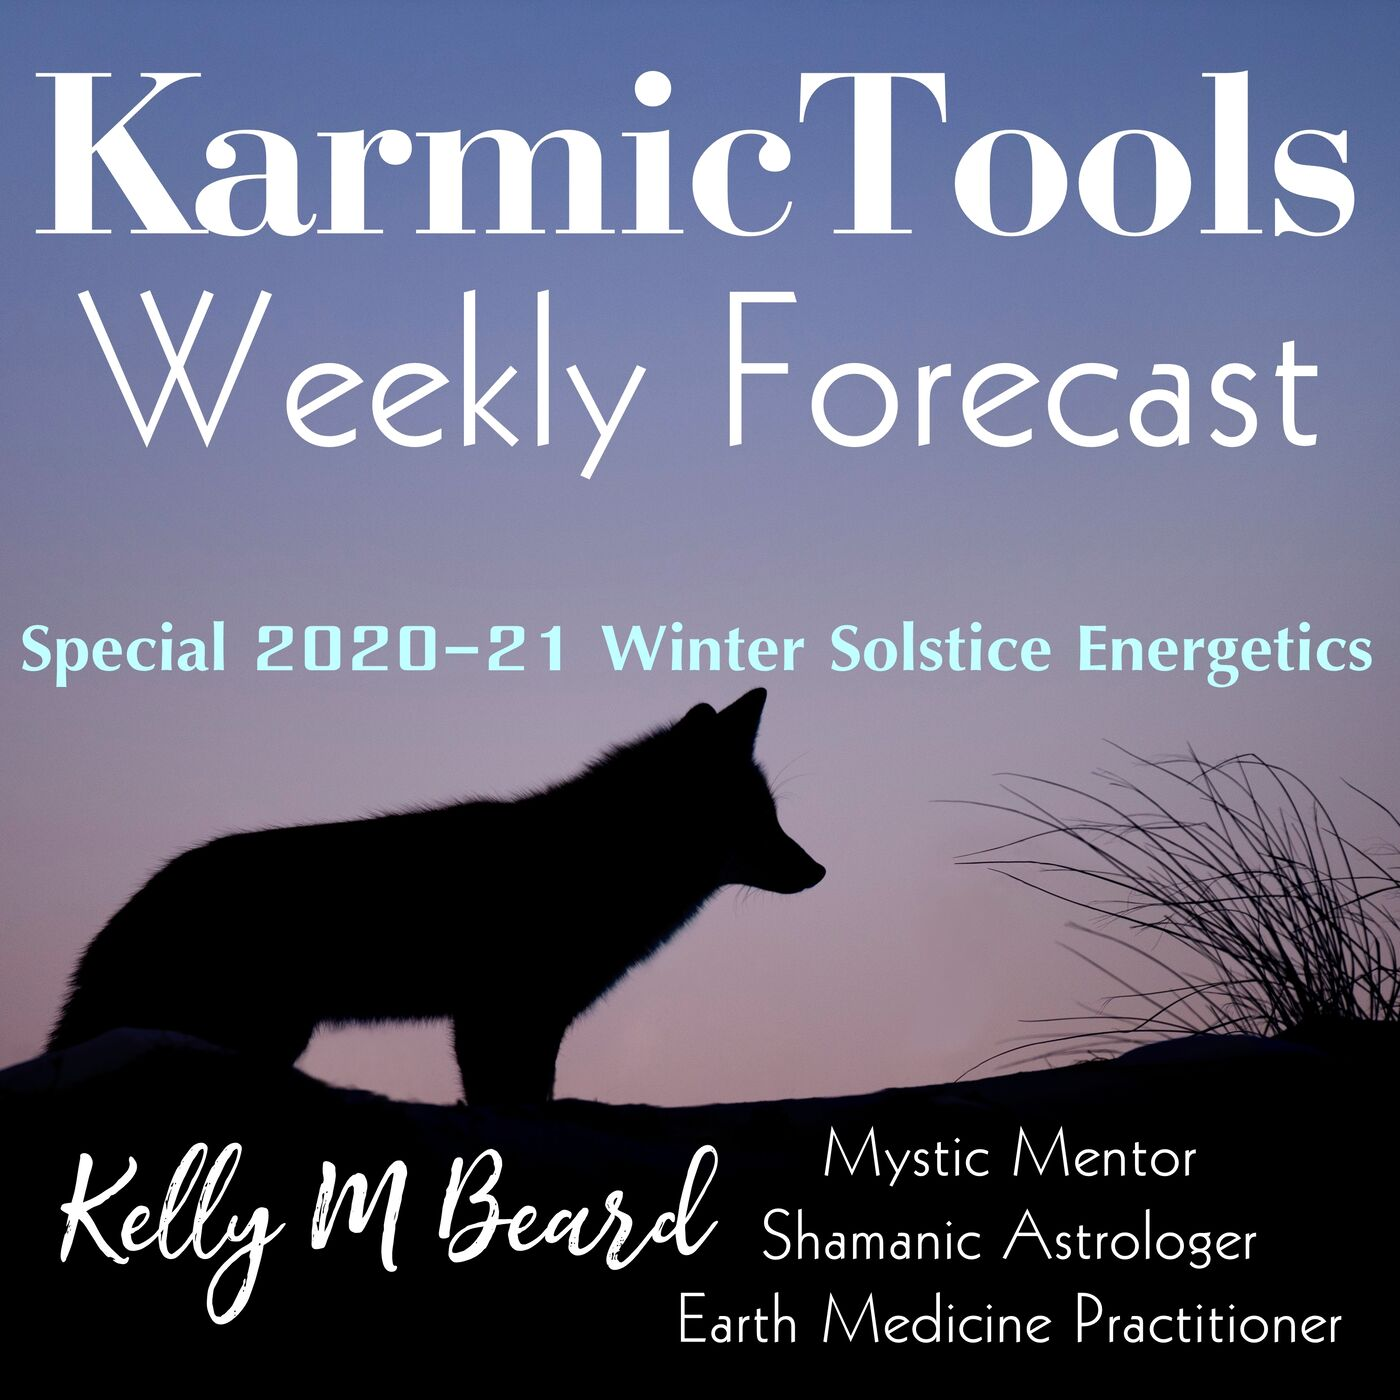 Special Energetics of Winter Solstice 2020-21 ~ Excerpt by Kelly M Beard